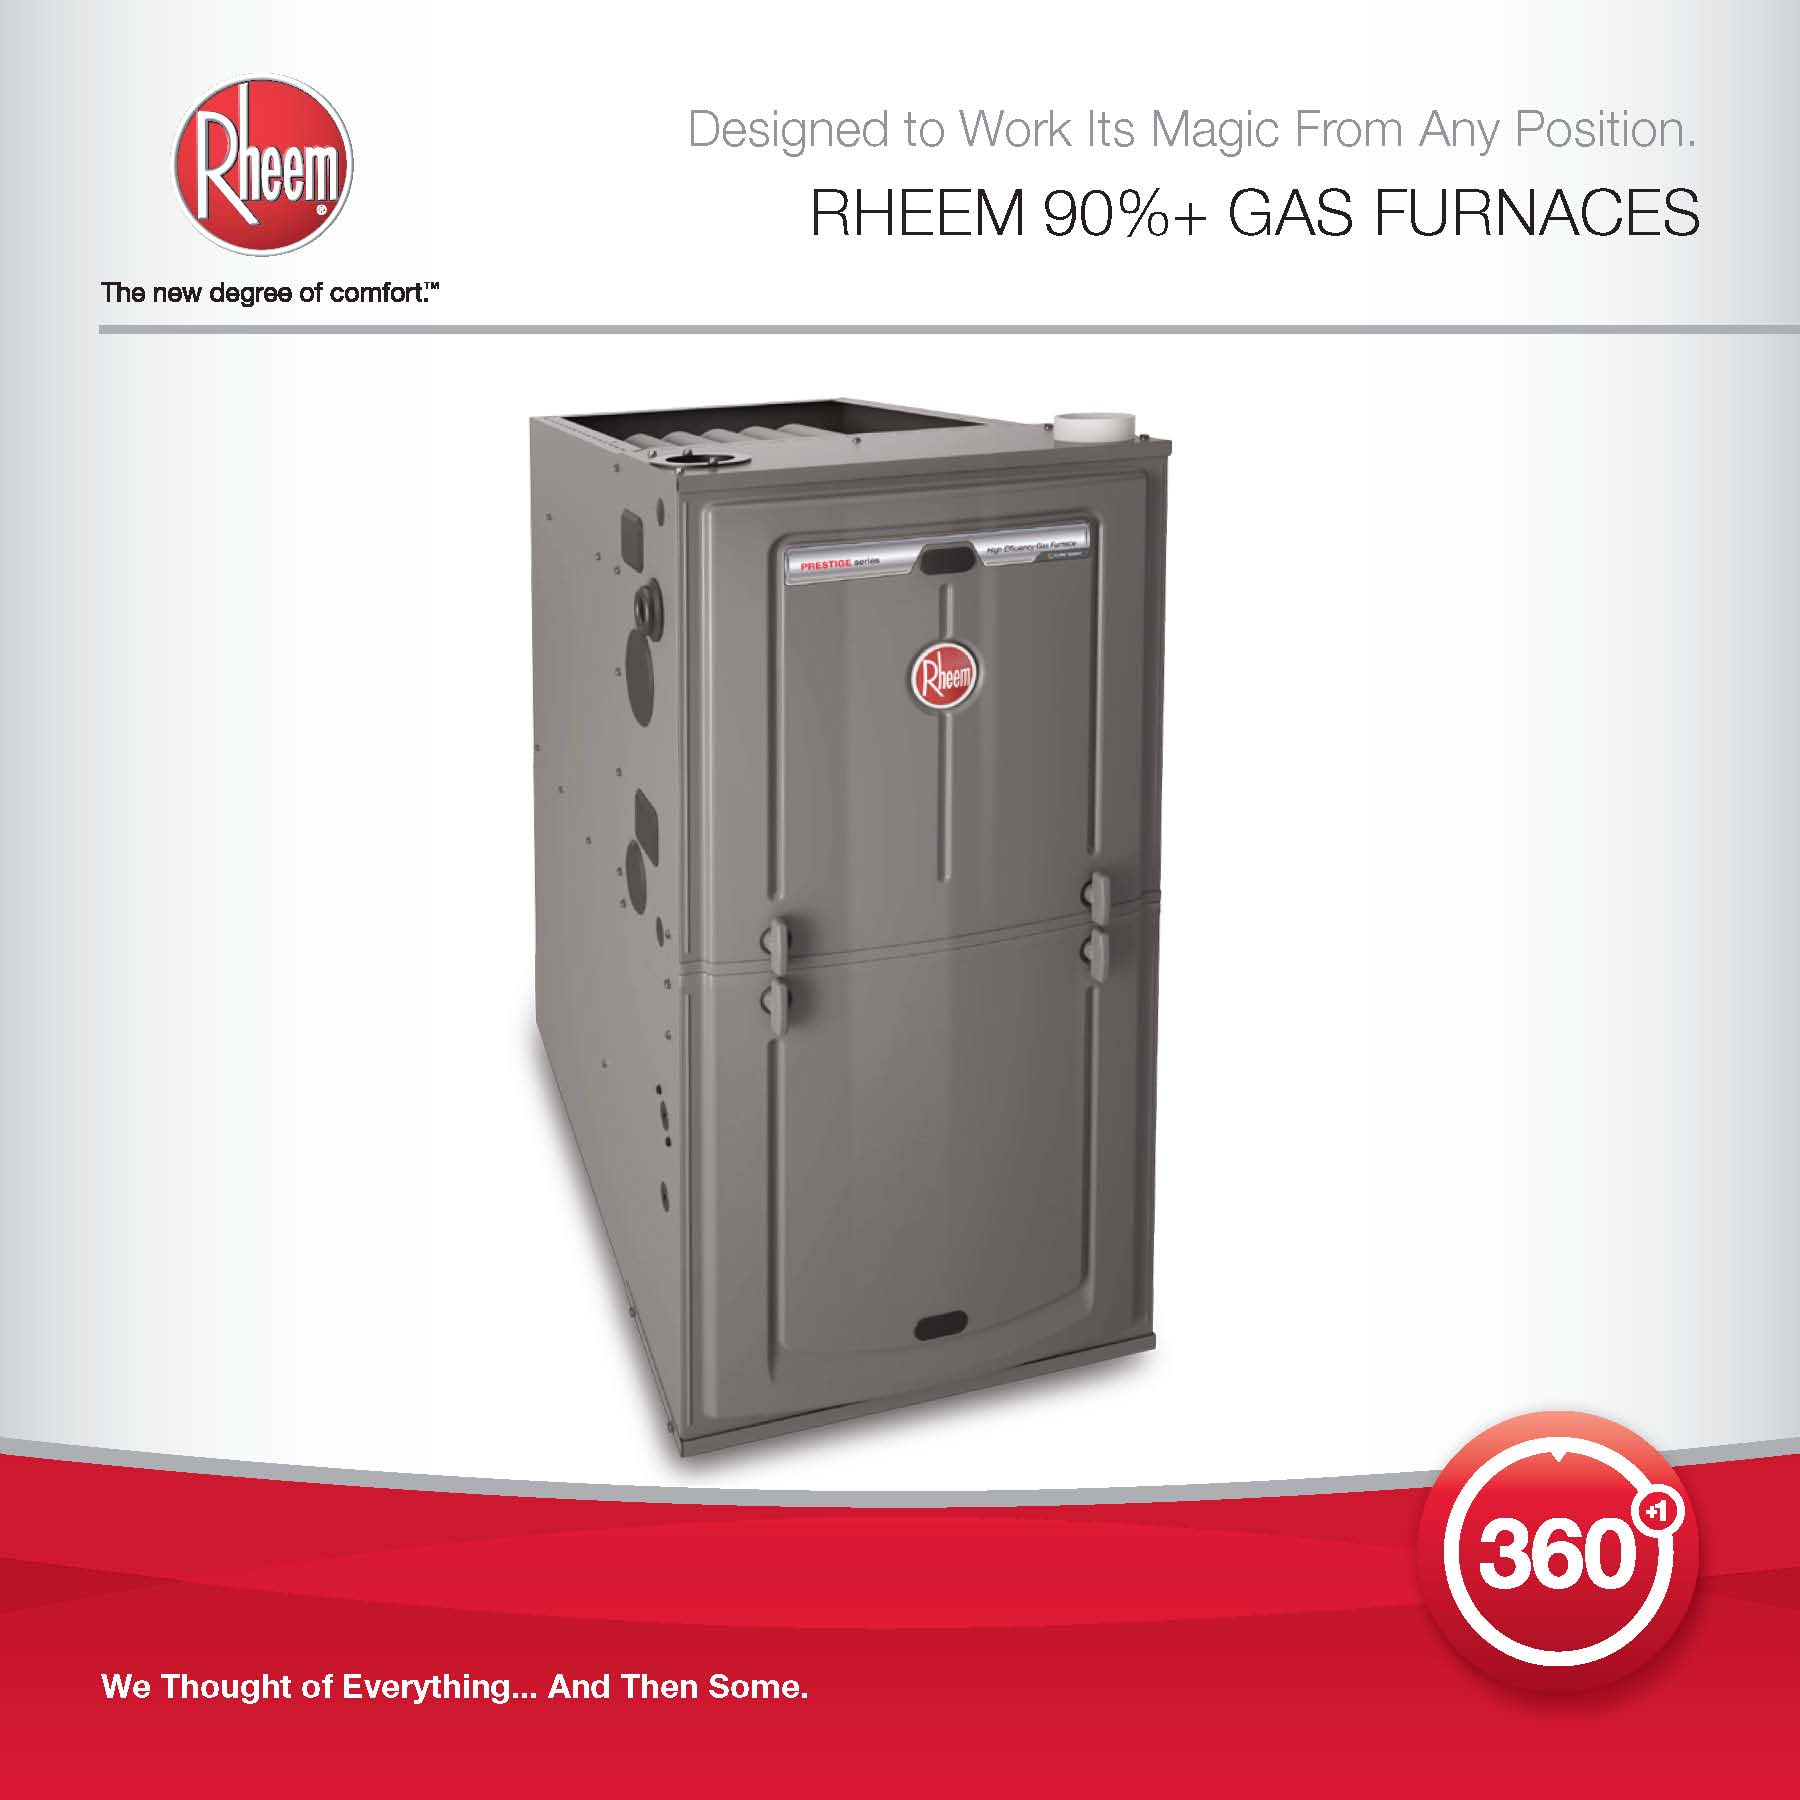 Rheem 90s Dealer Brochure_Cover rnnl rheem wiring diagram,rheem \u2022 45 63 74 91  at bakdesigns.co